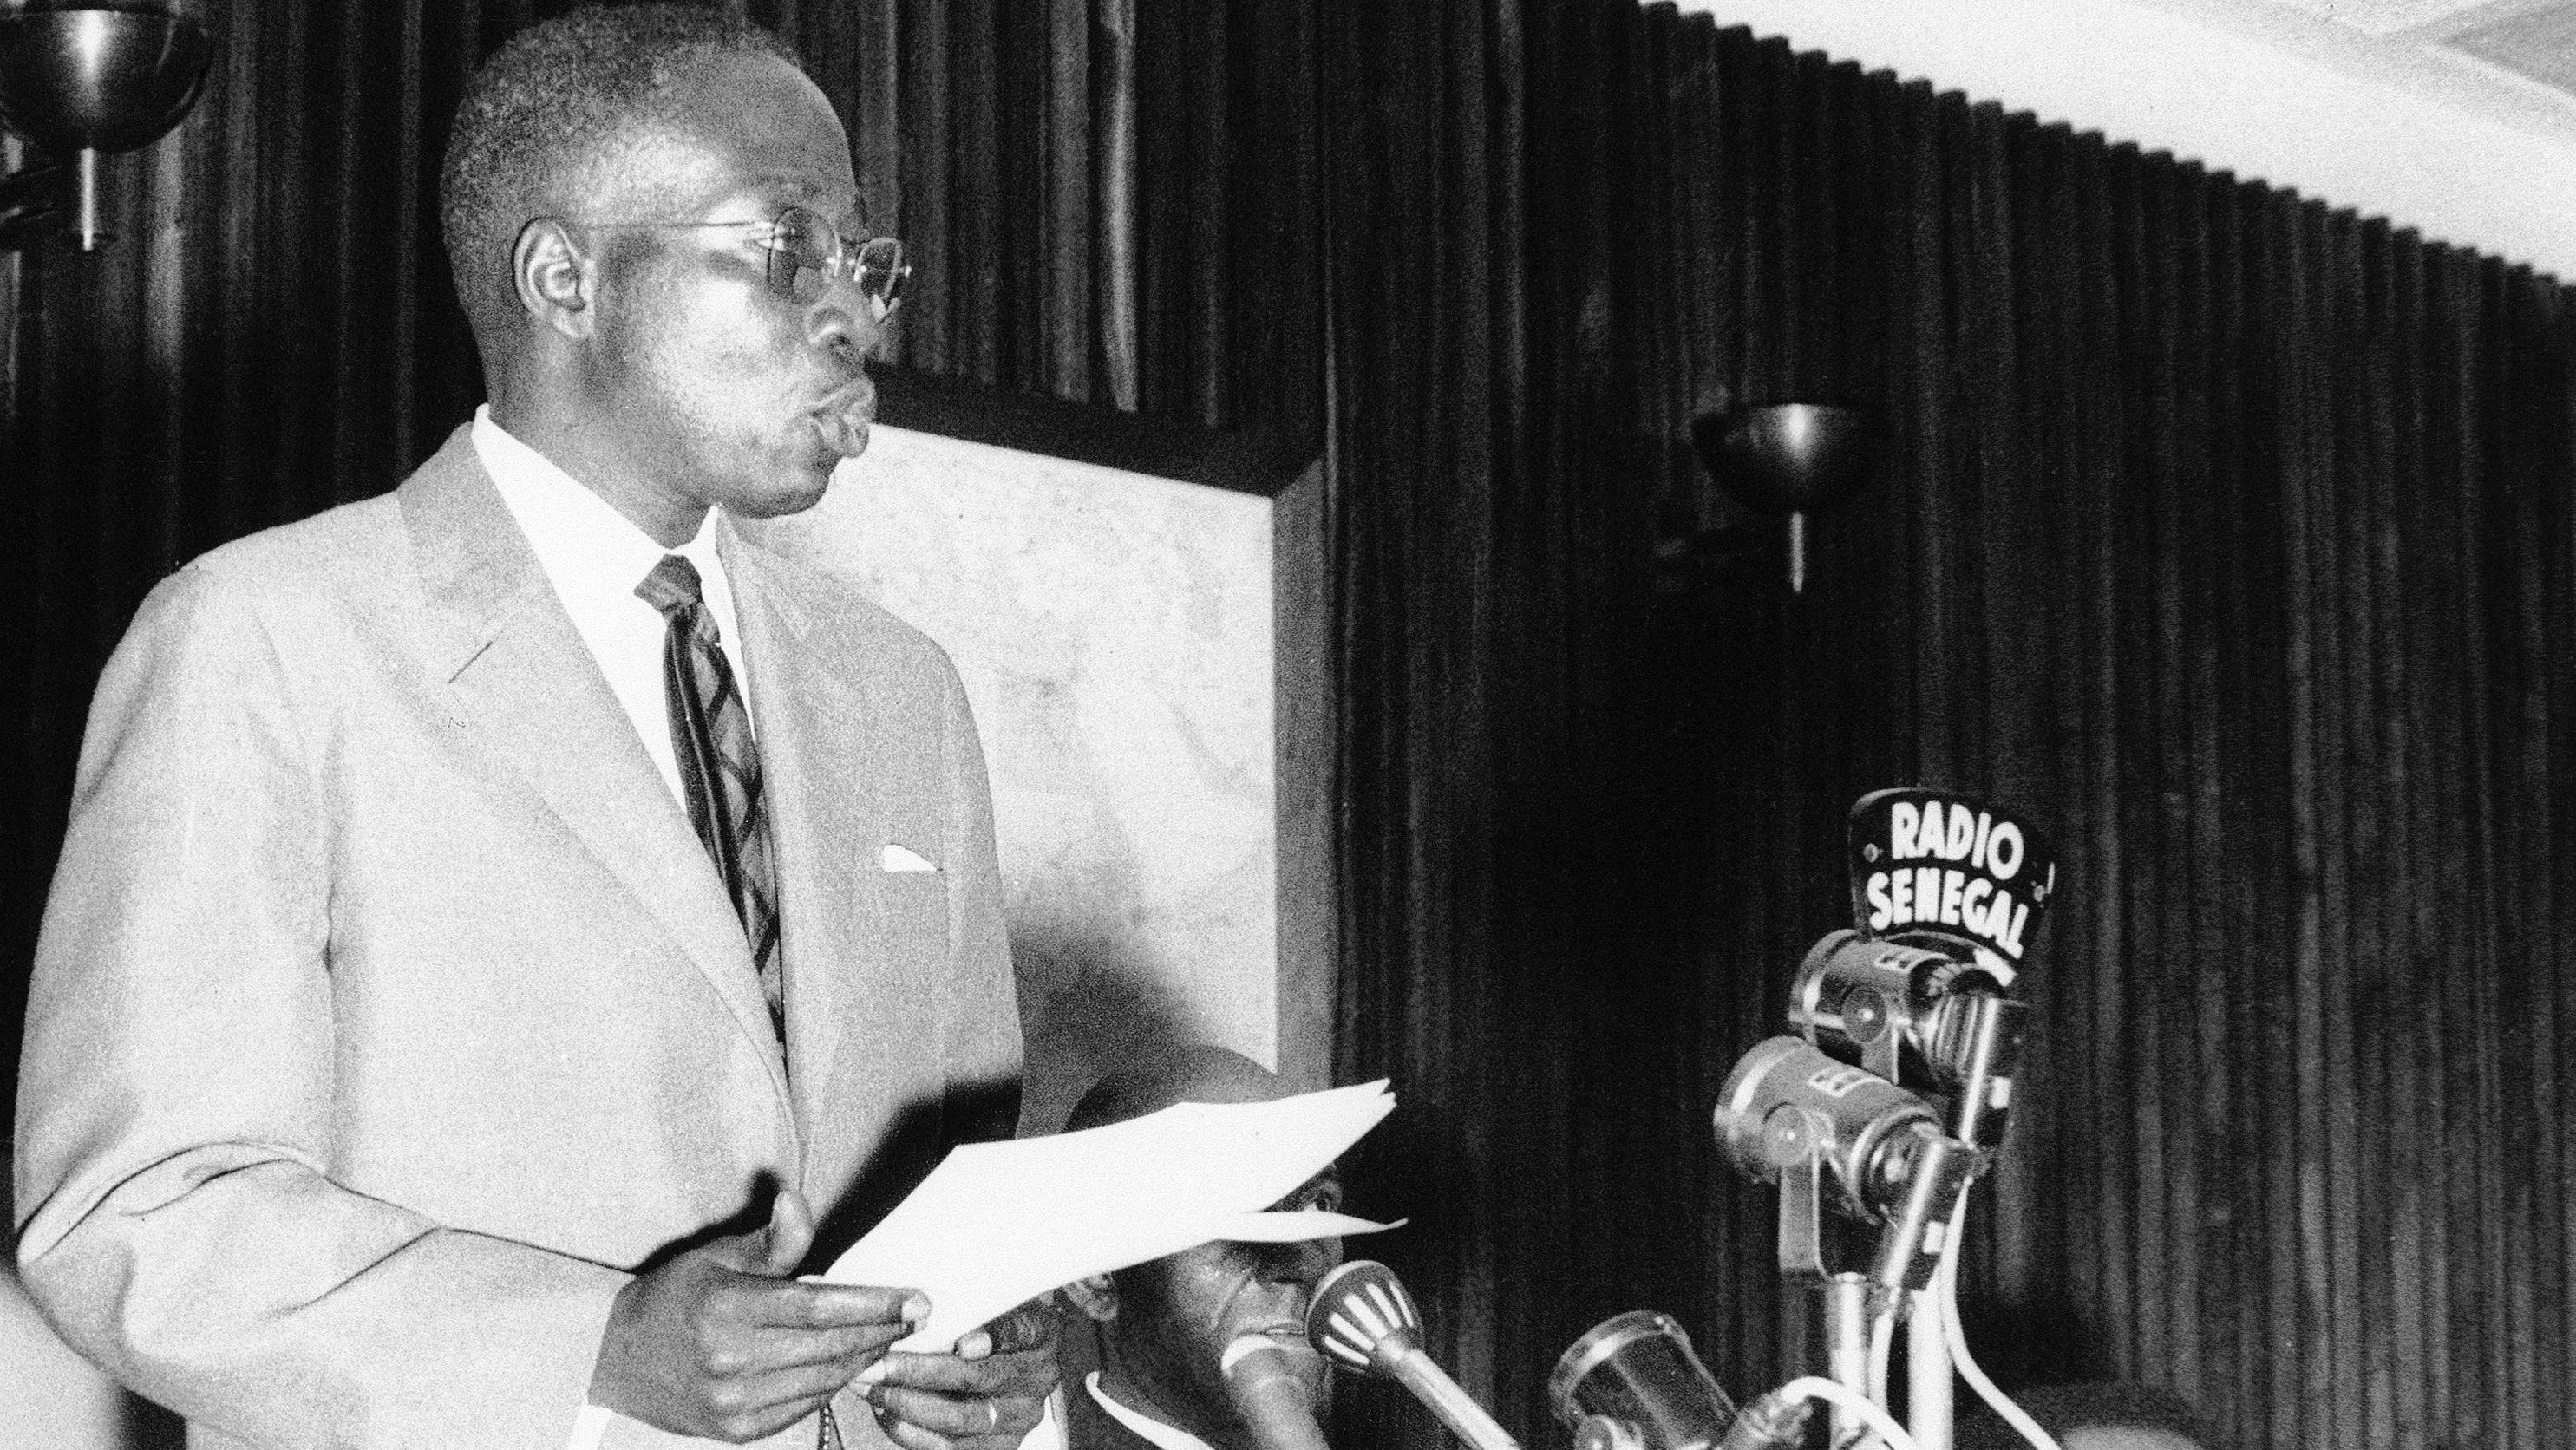 President Leopold Senghor